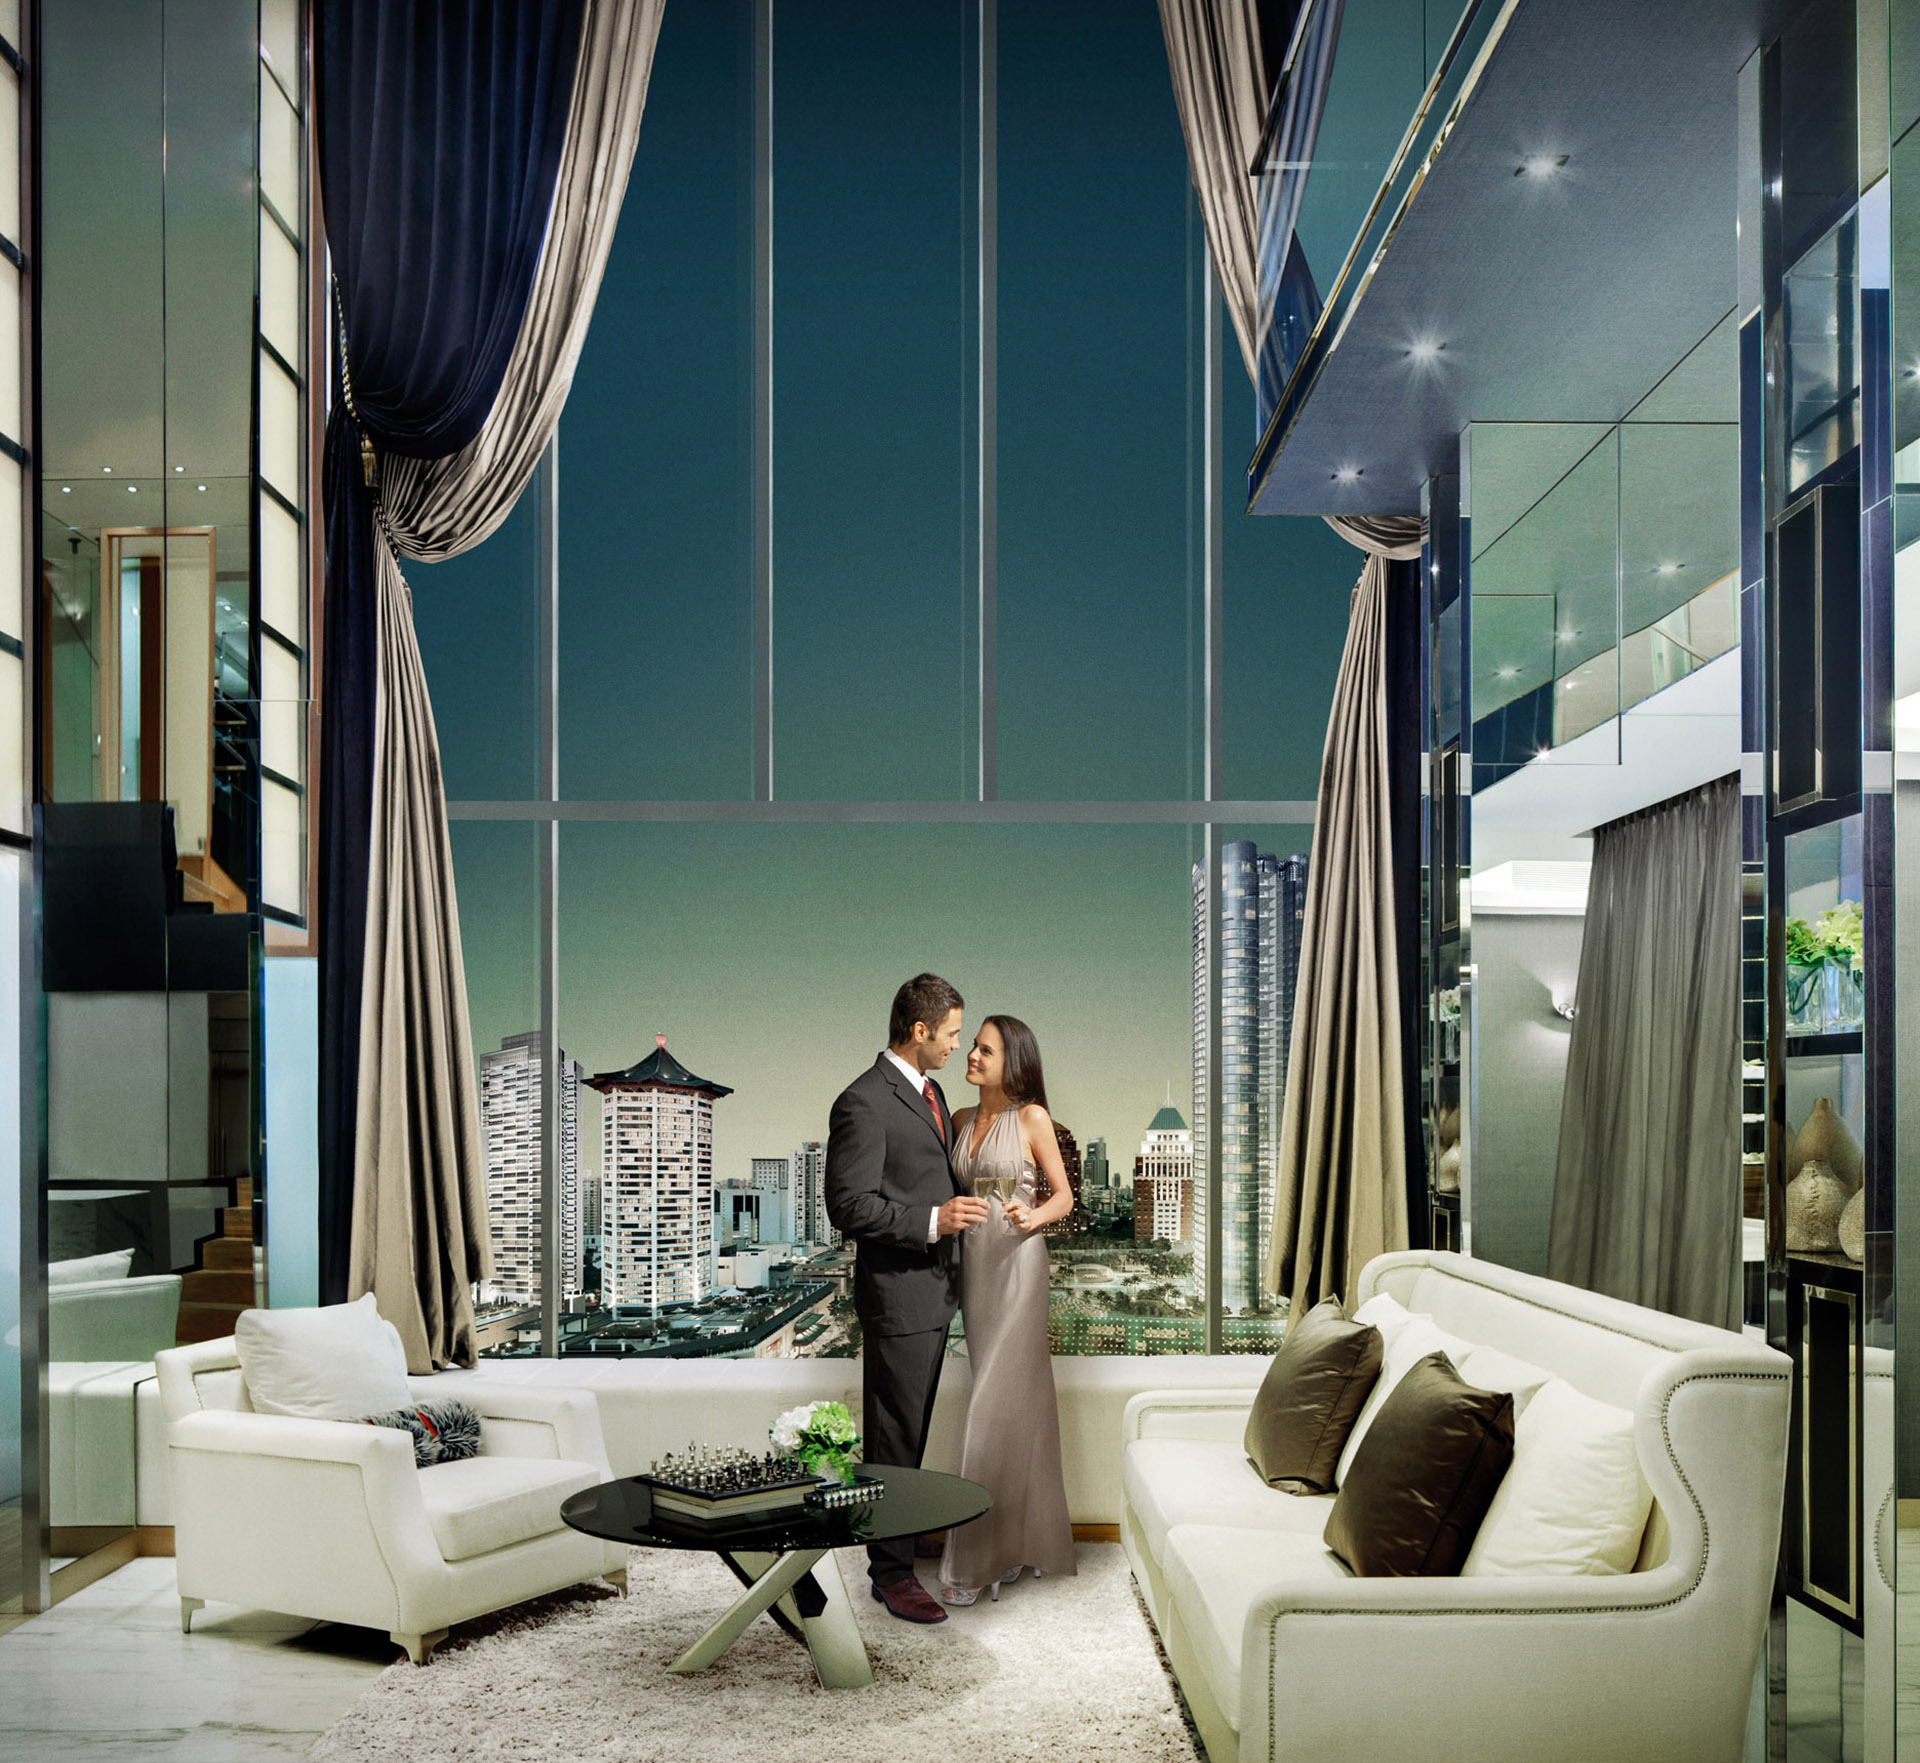 007 Skyline_LivingRoom_Couple_231012